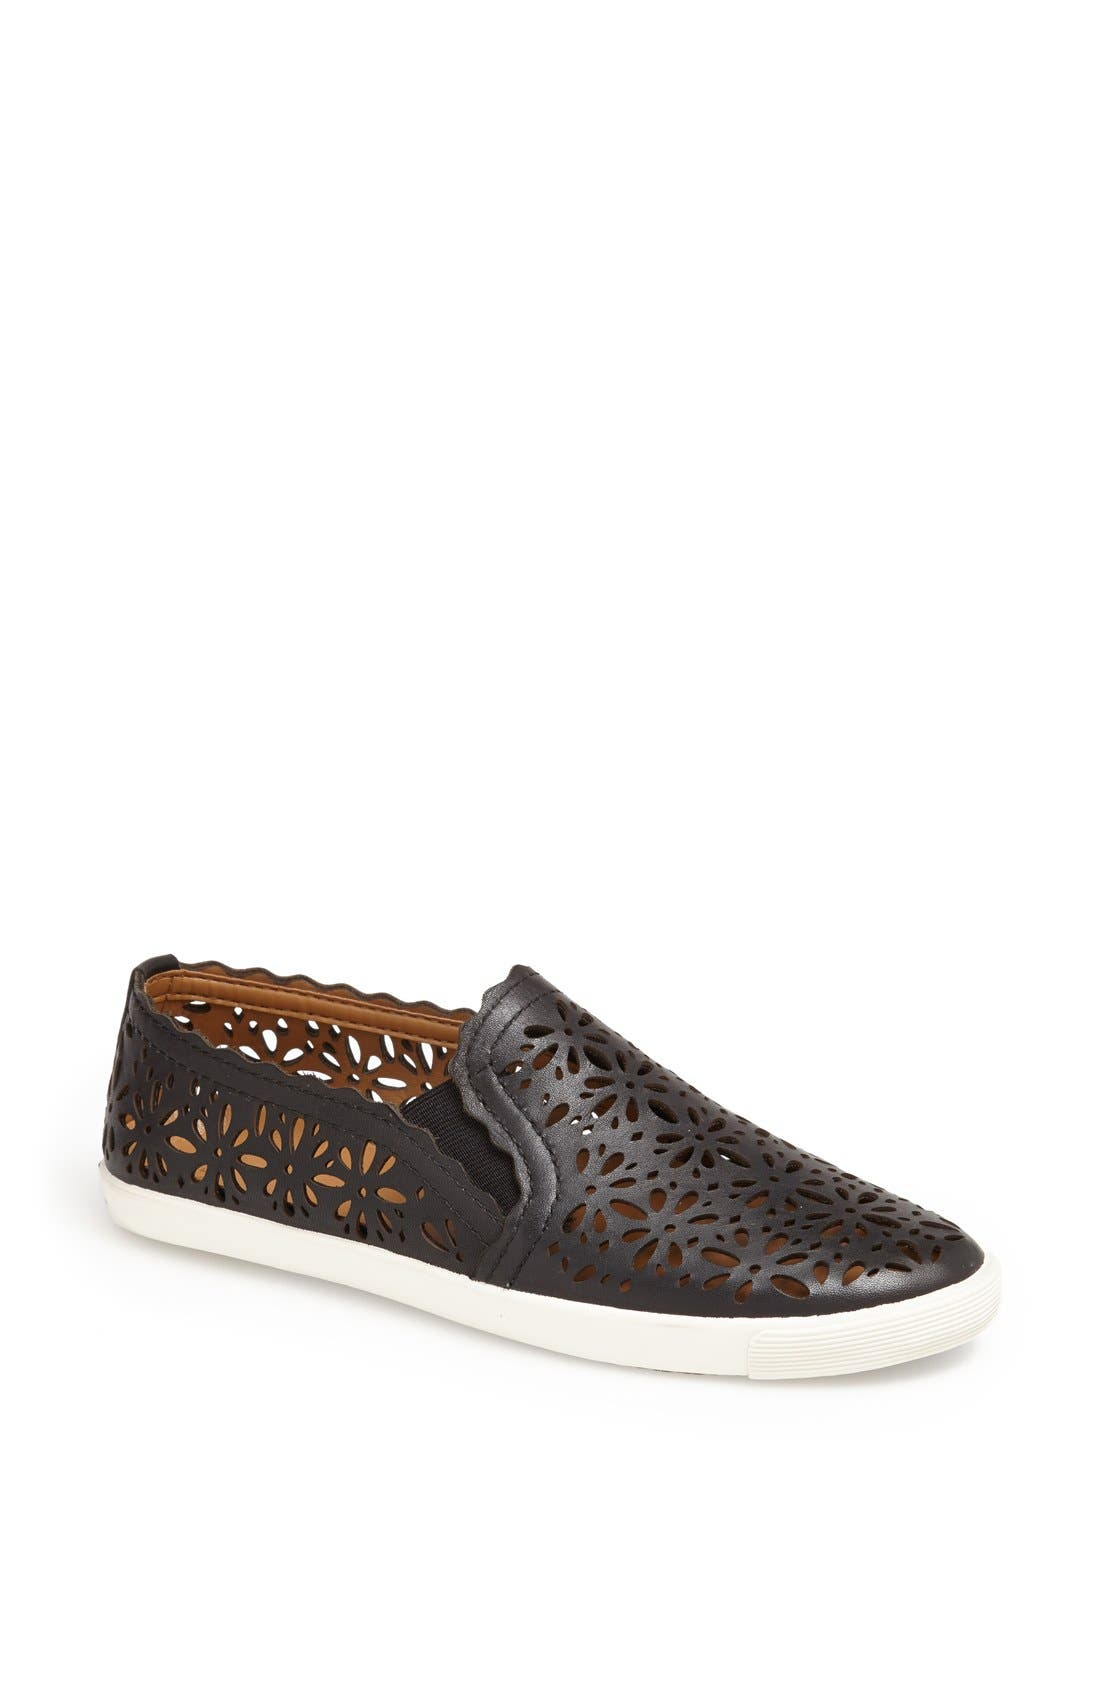 AERIN 'Murex' Perforated Slip-On Sneaker, Main, color, 001